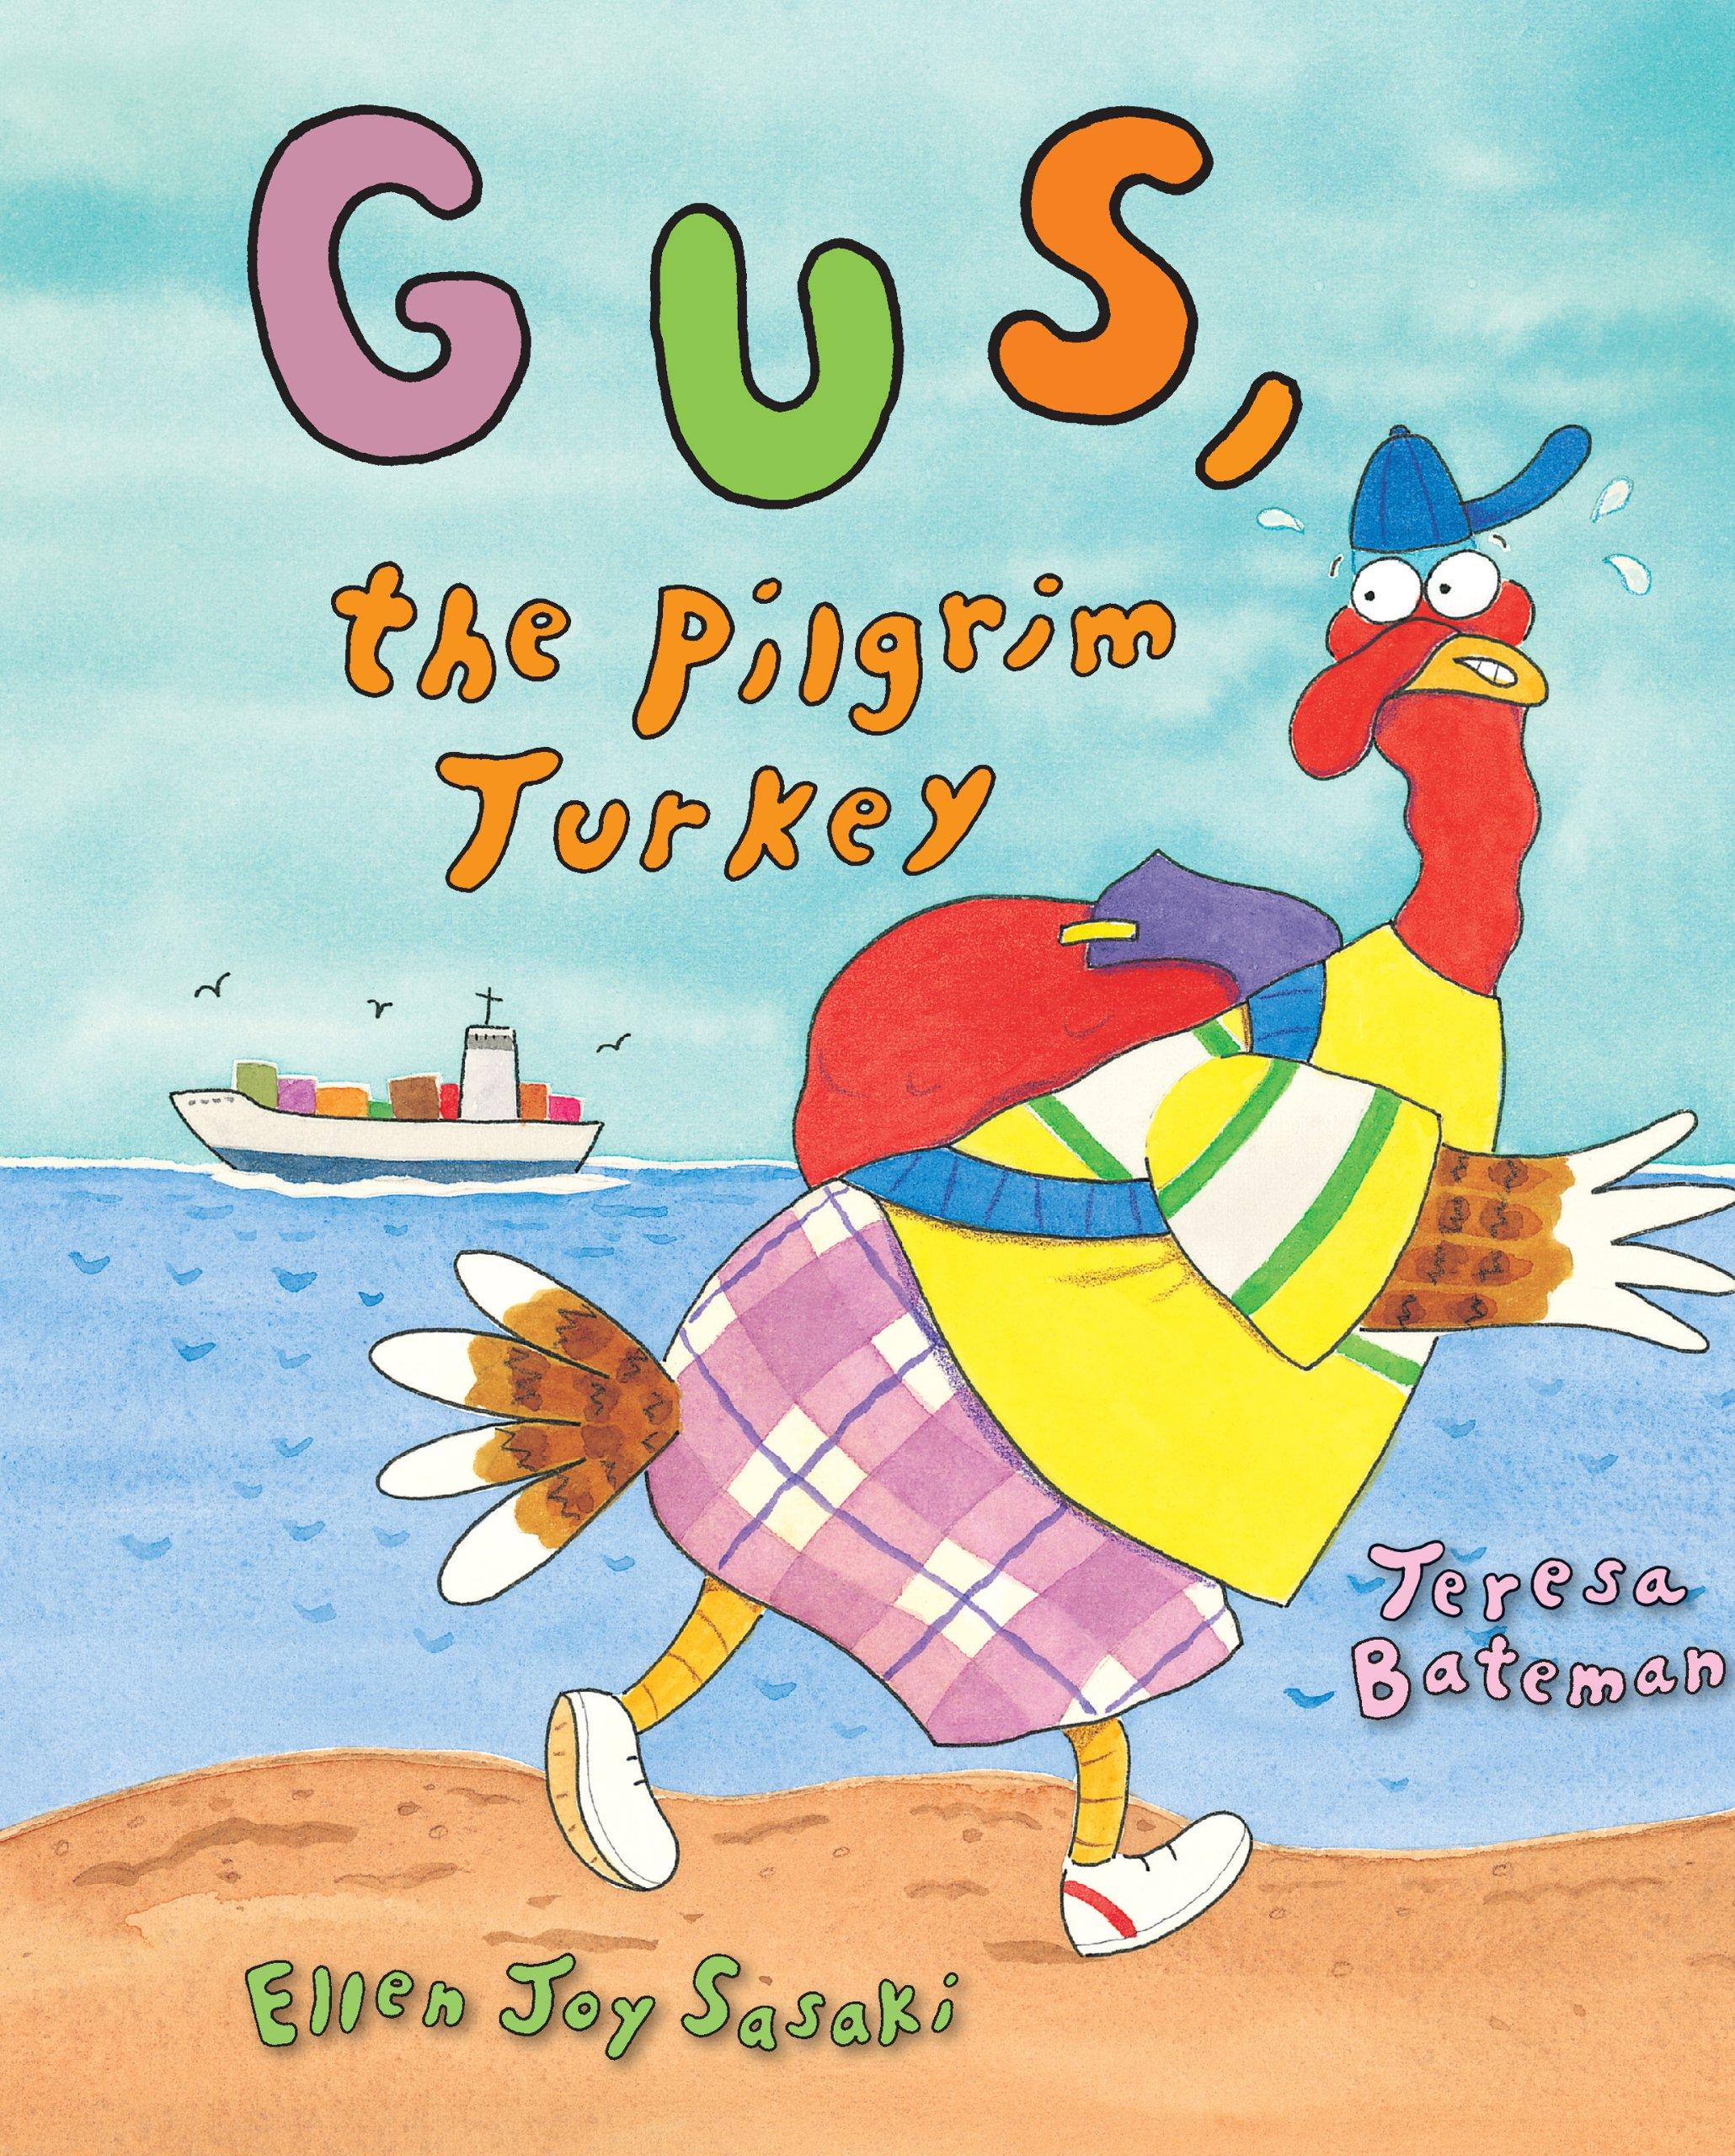 Gus the Pilgrim Turkey (English Edition)